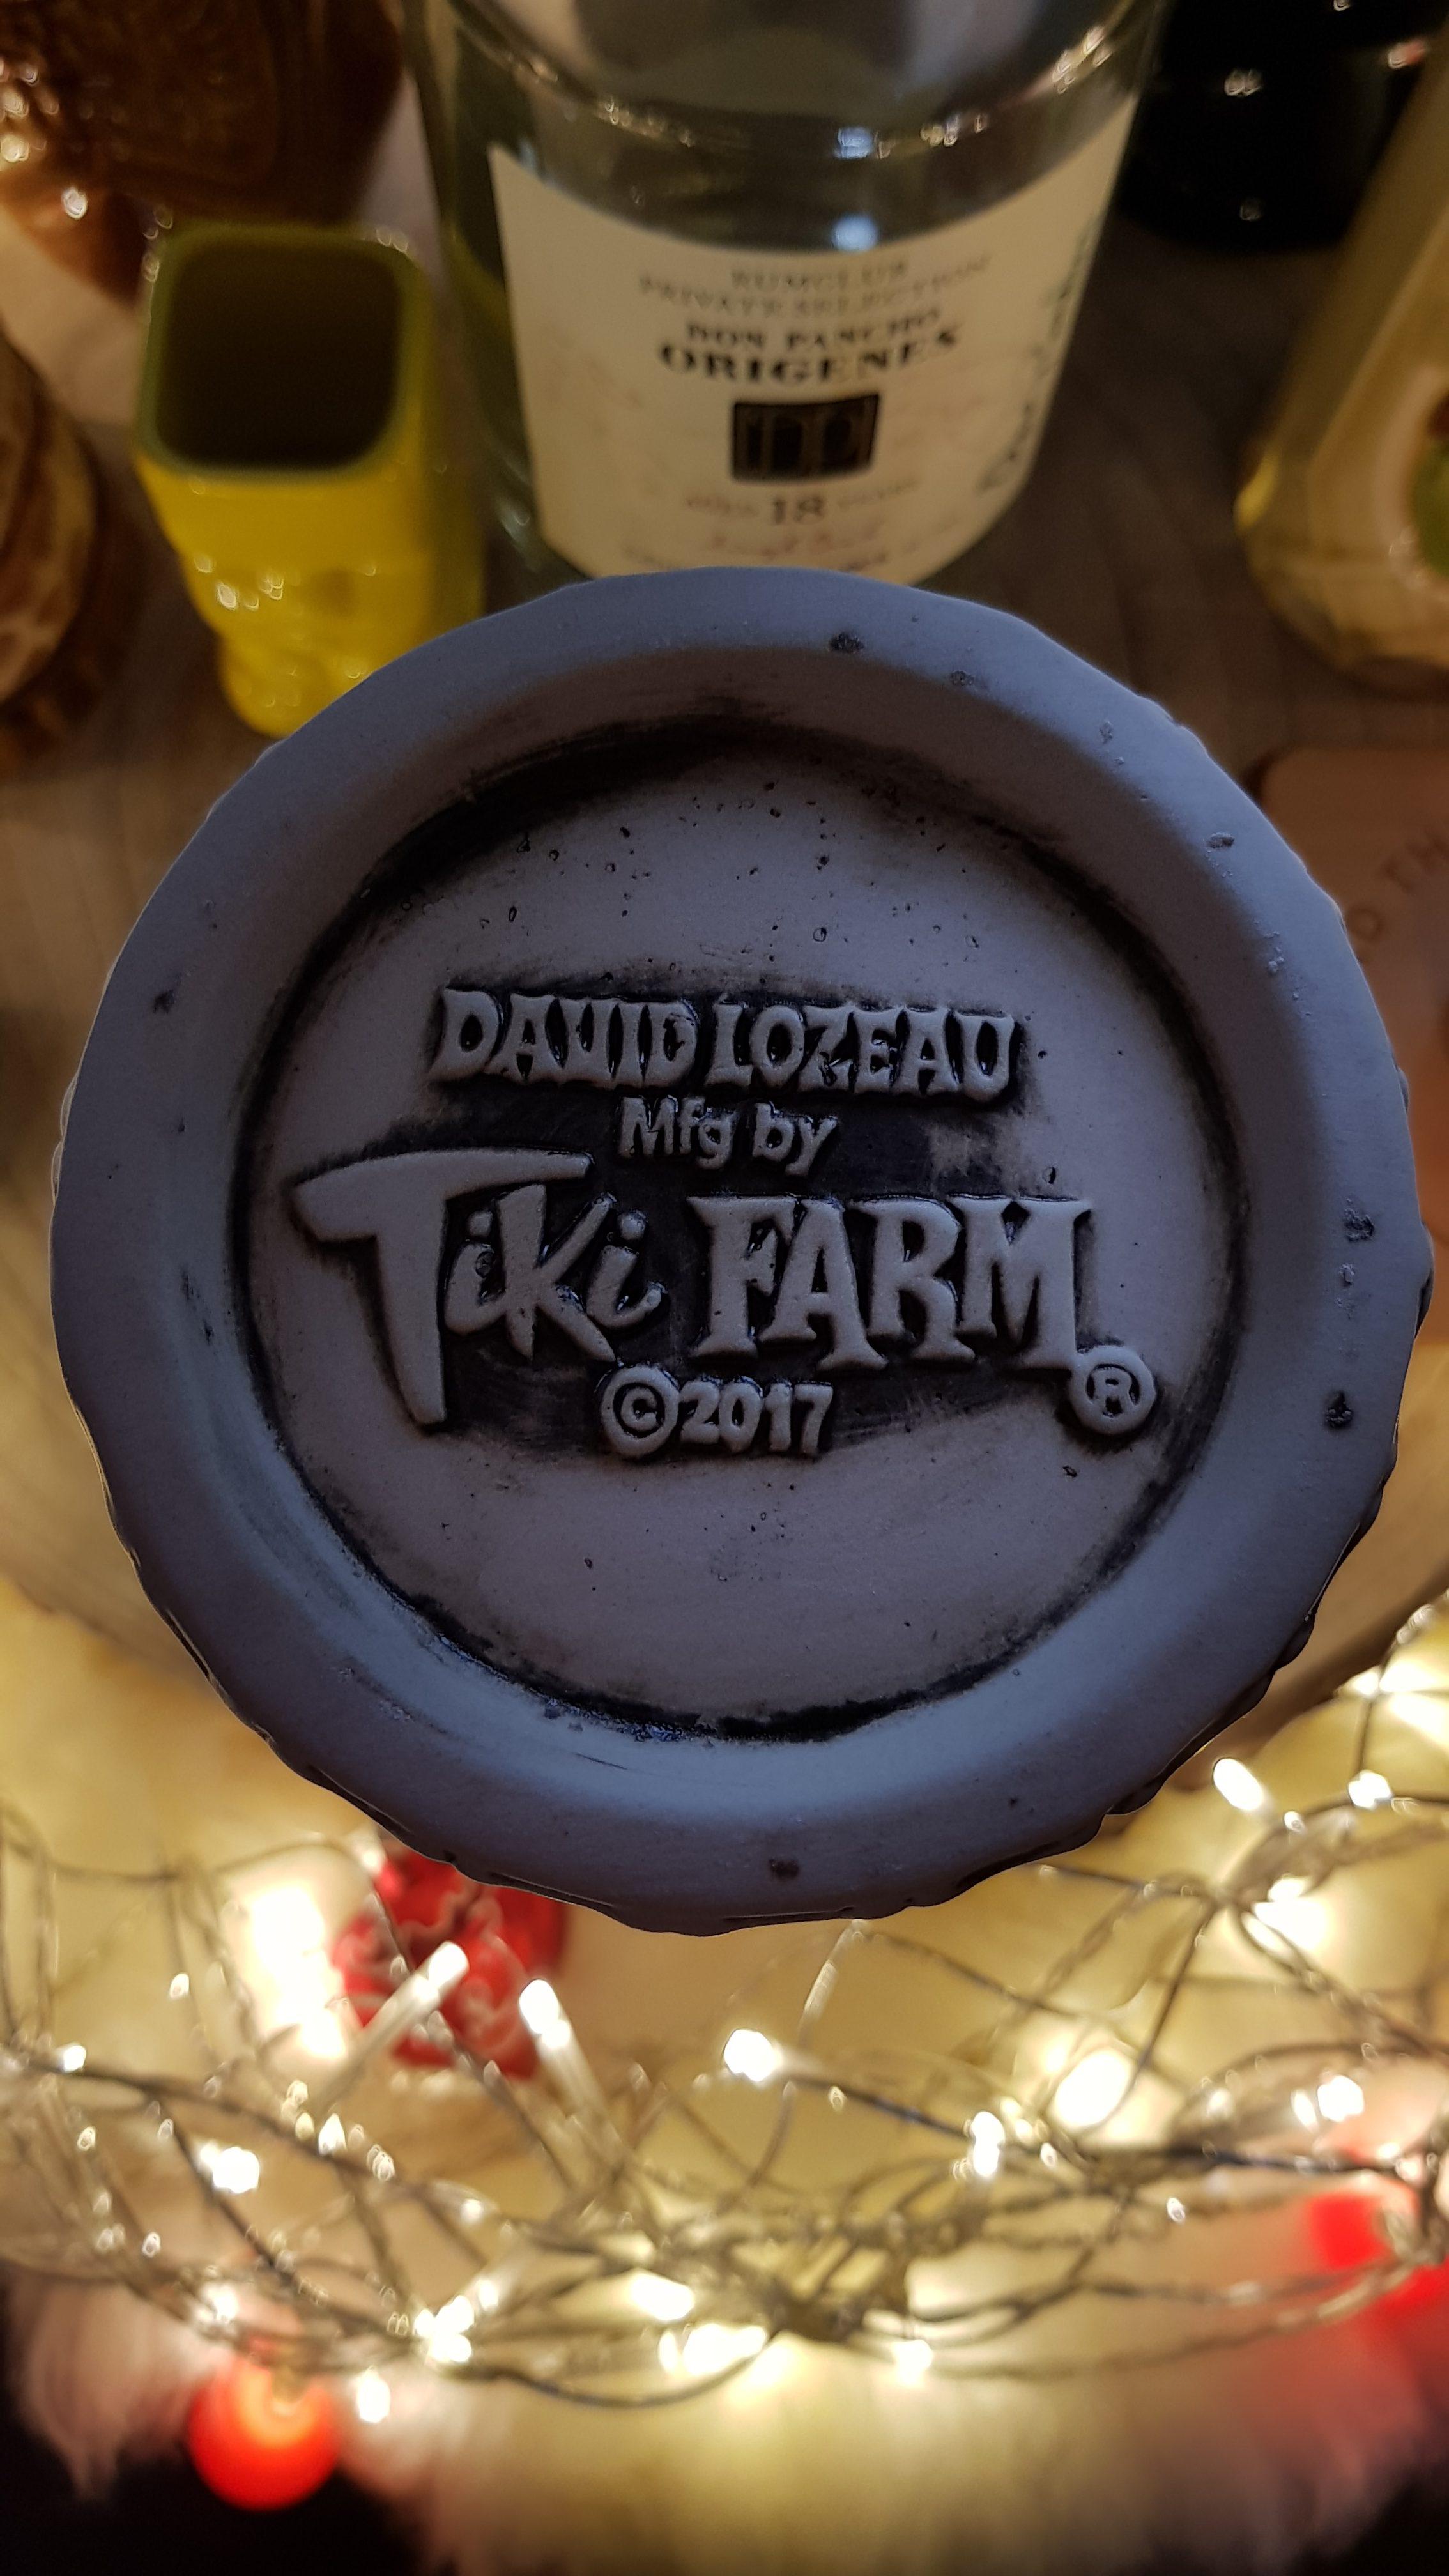 Tiki Farm - AMOR Eterno SKULL GOBLET MUG - by David Lozeau